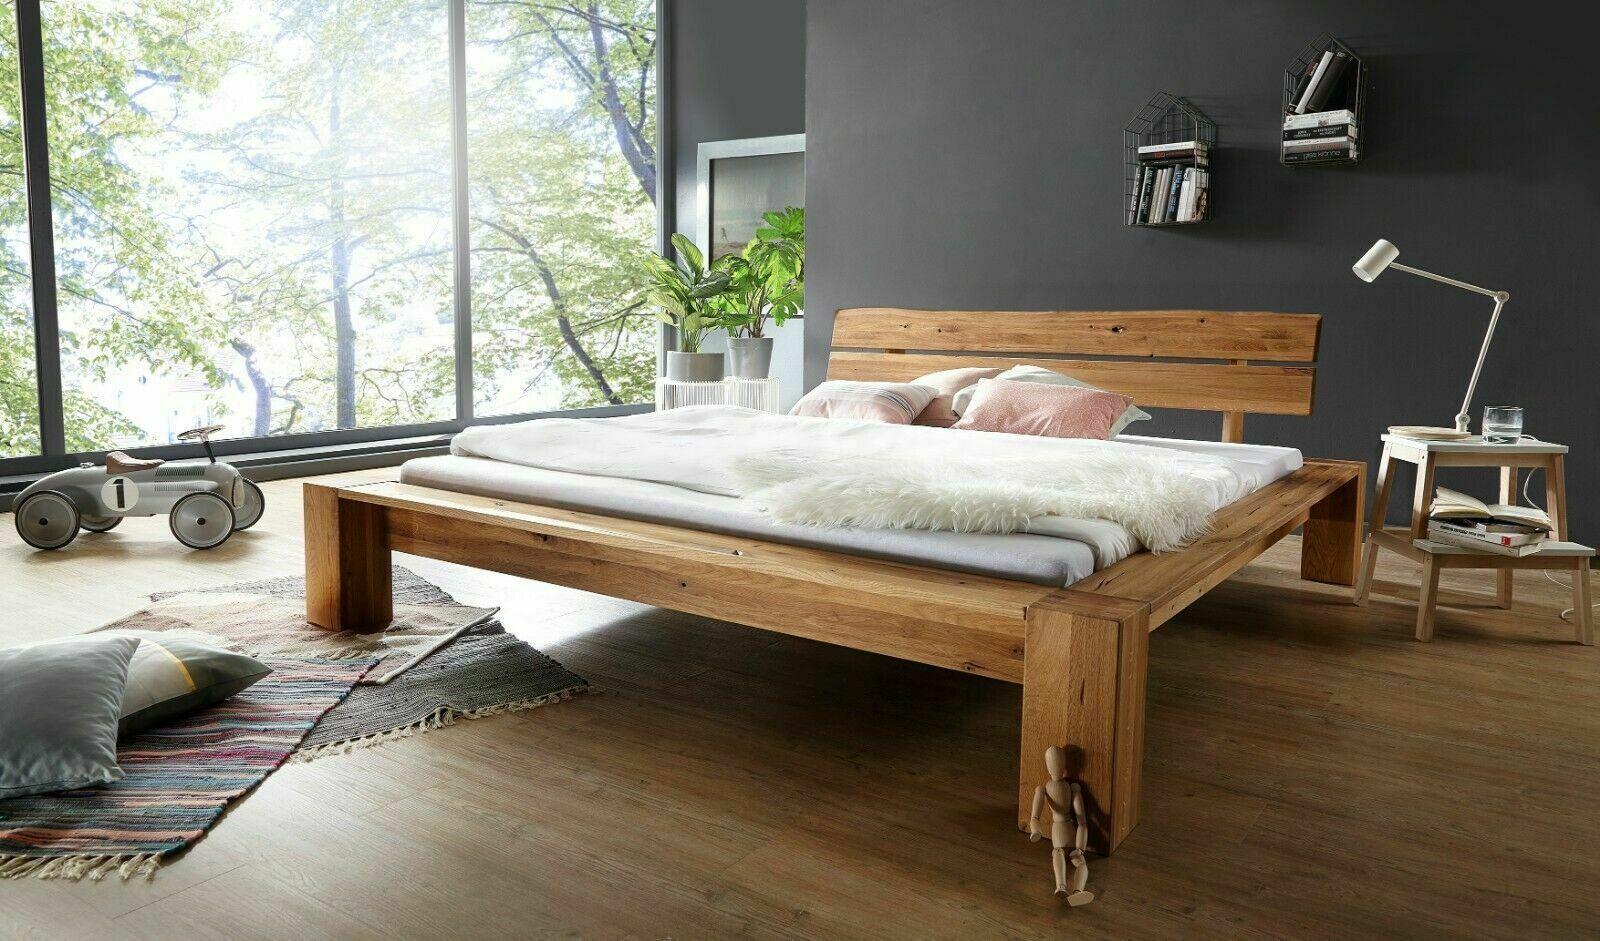 Bett Be 0286 Wildeiche Geölt Kopfteil Baumkante Schlafzimmer 180x200 Cm Holzbett Ebay In 2021 Massivholzbett Haus Bett